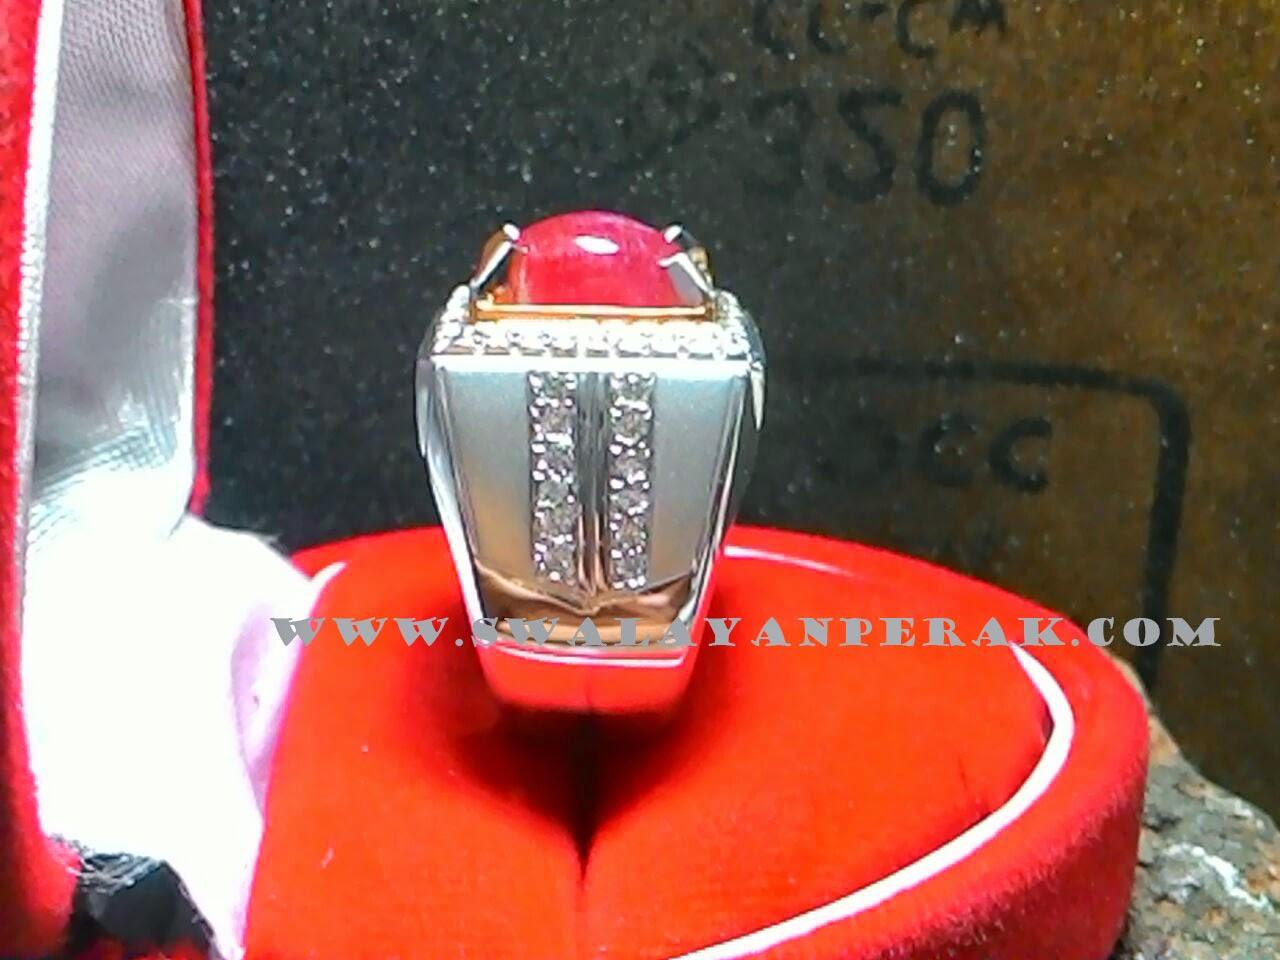 Contoh model cincin akik warna red silver unik